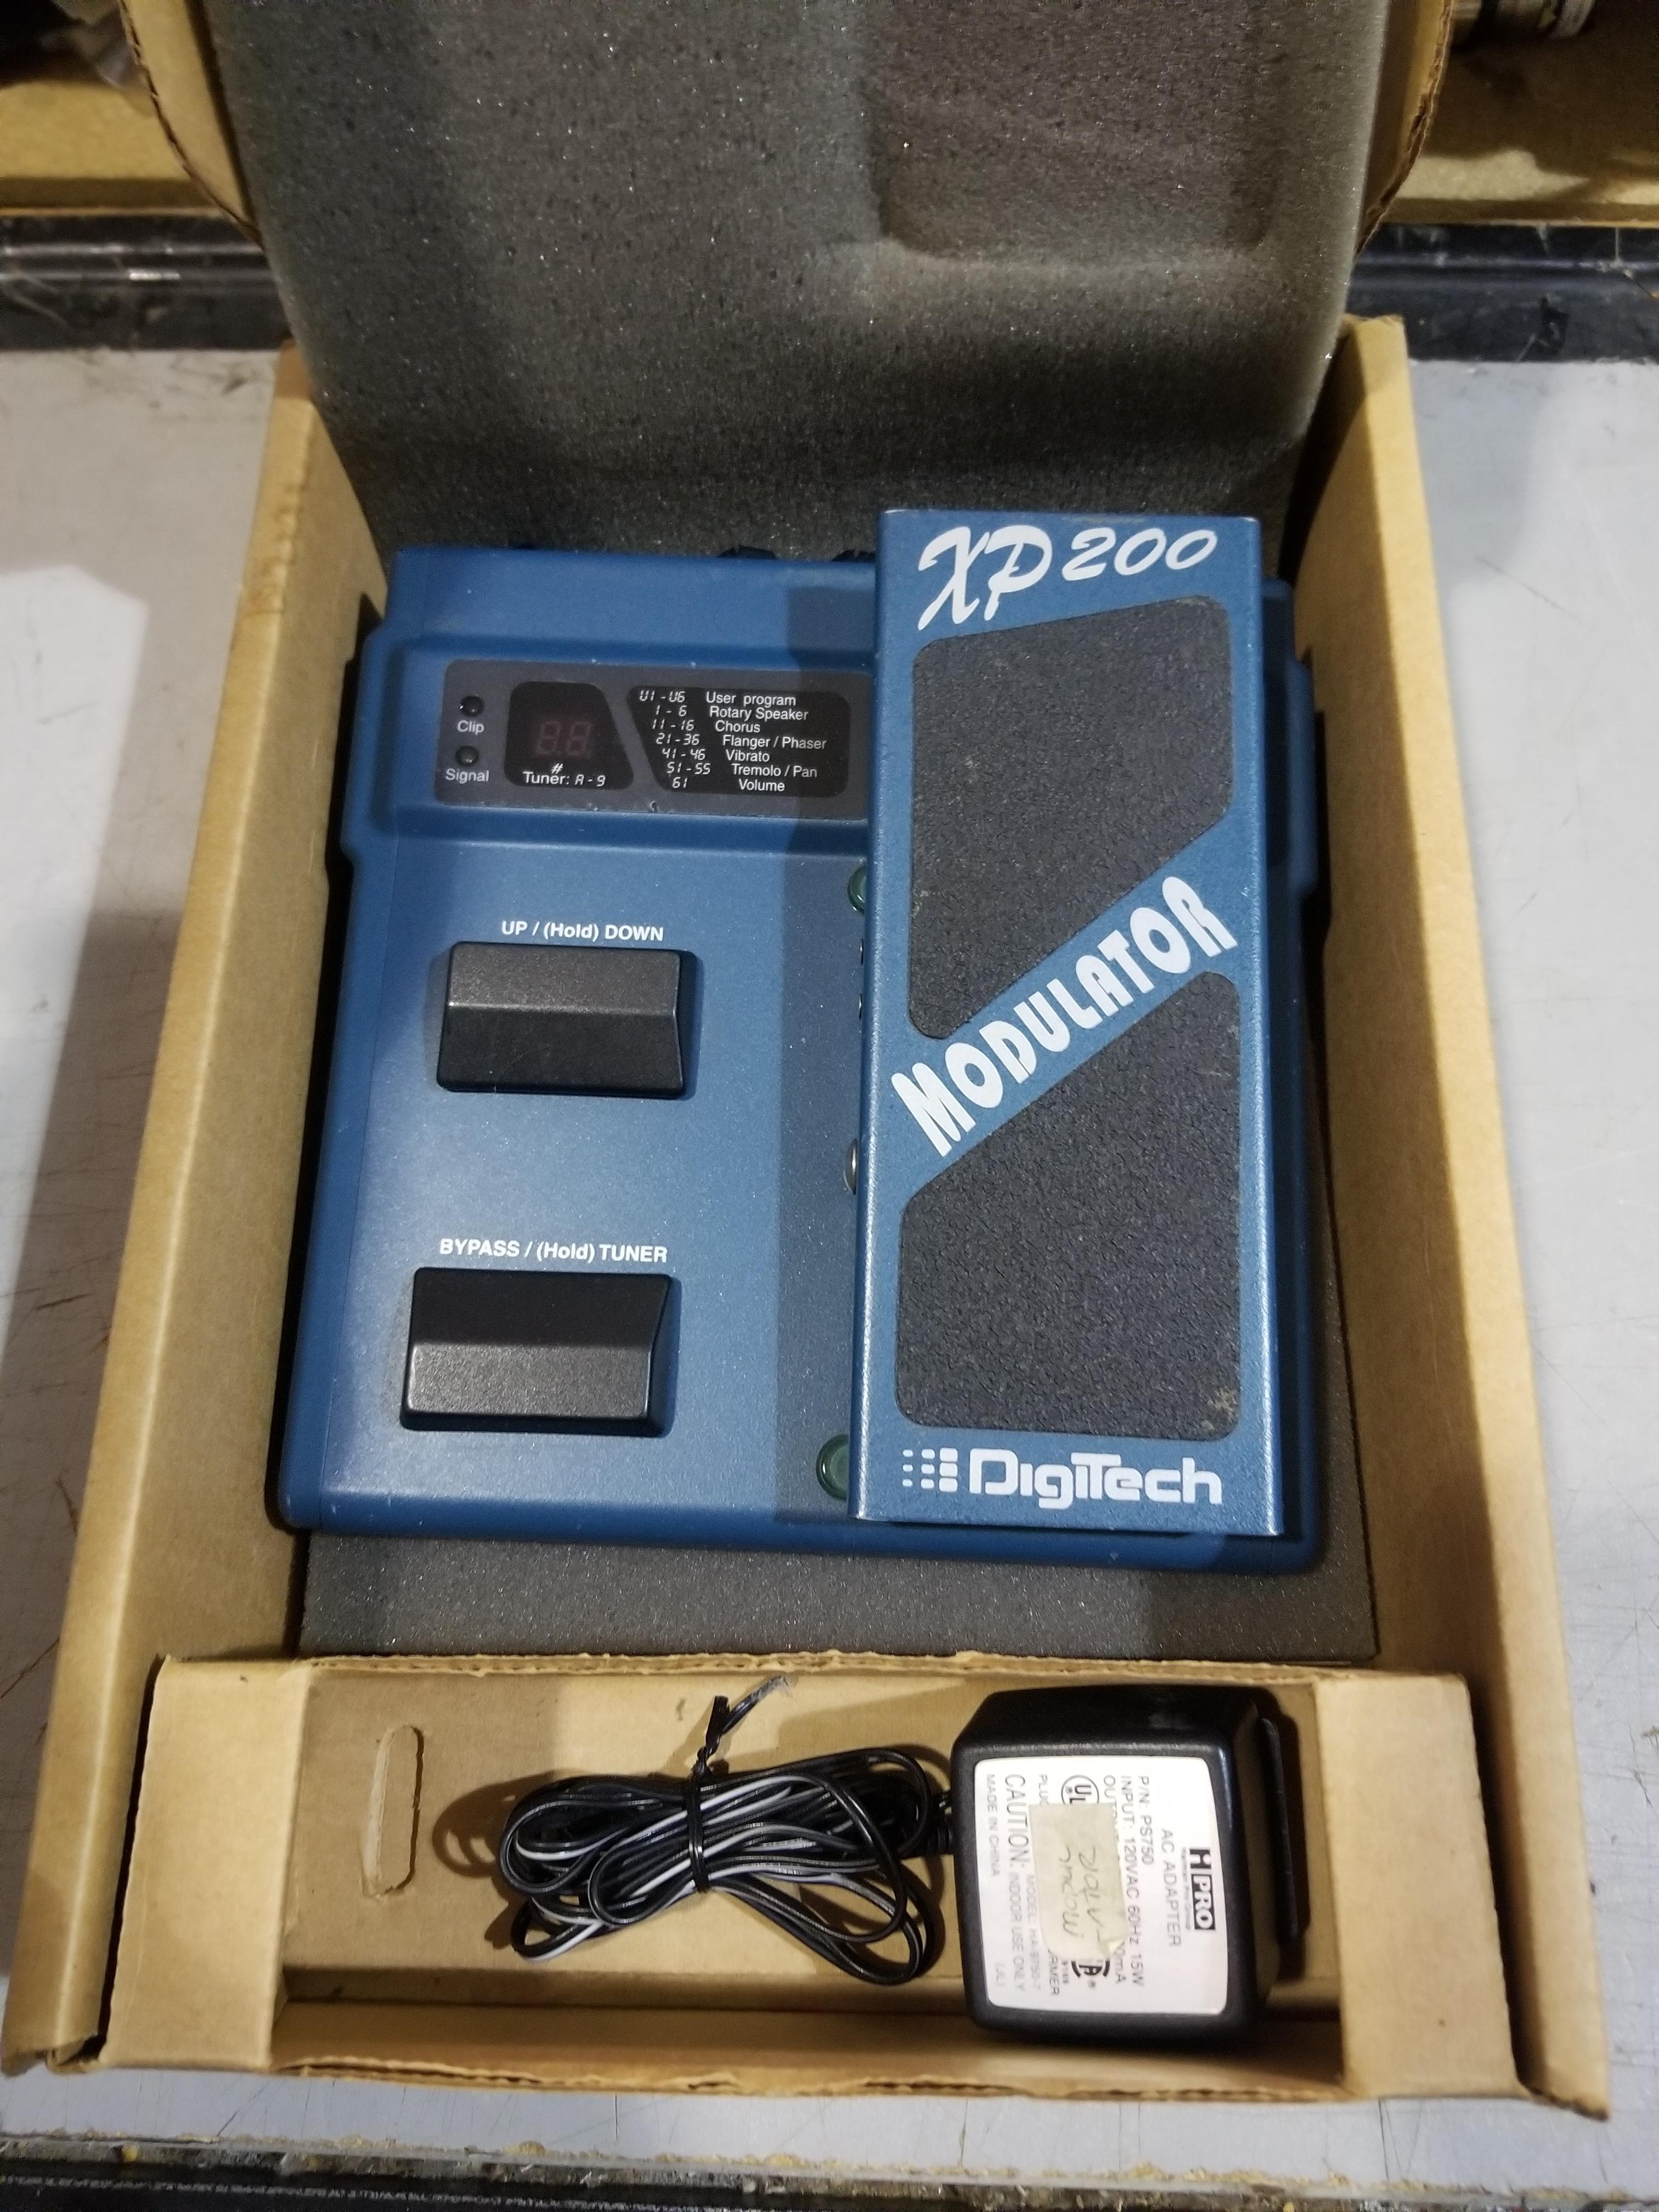 DIGITECH XP-200 Multi-Fx Modulator Effect Pedal